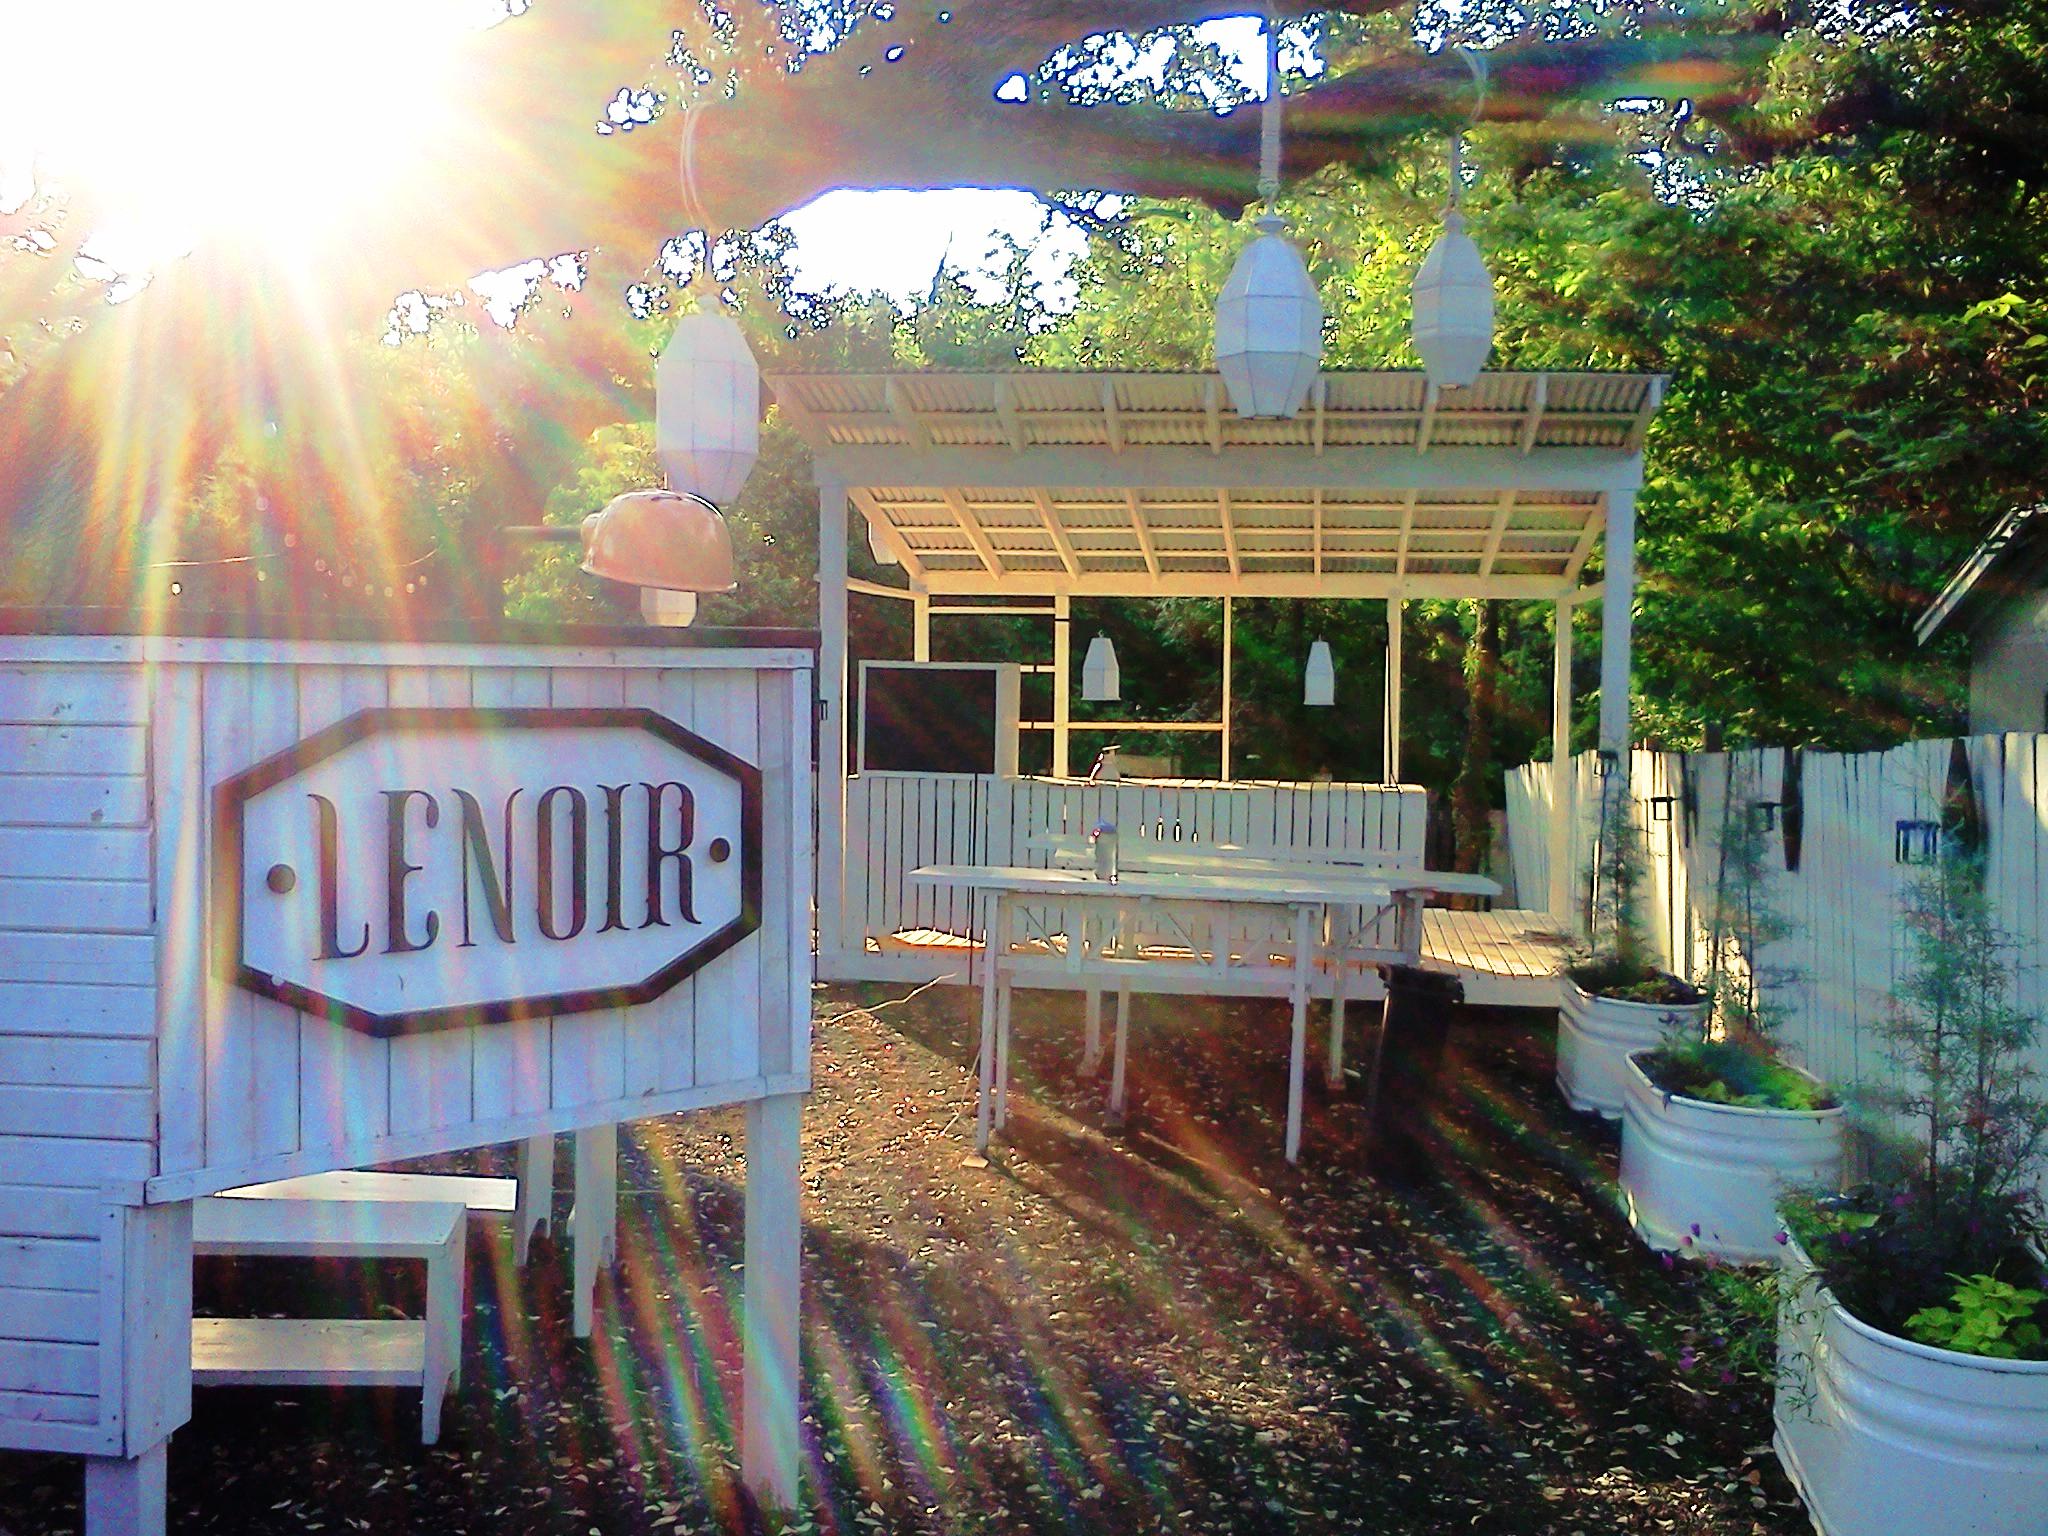 nf-C-Lenoir-Outdoor-Serving-Station-pic1.jpg